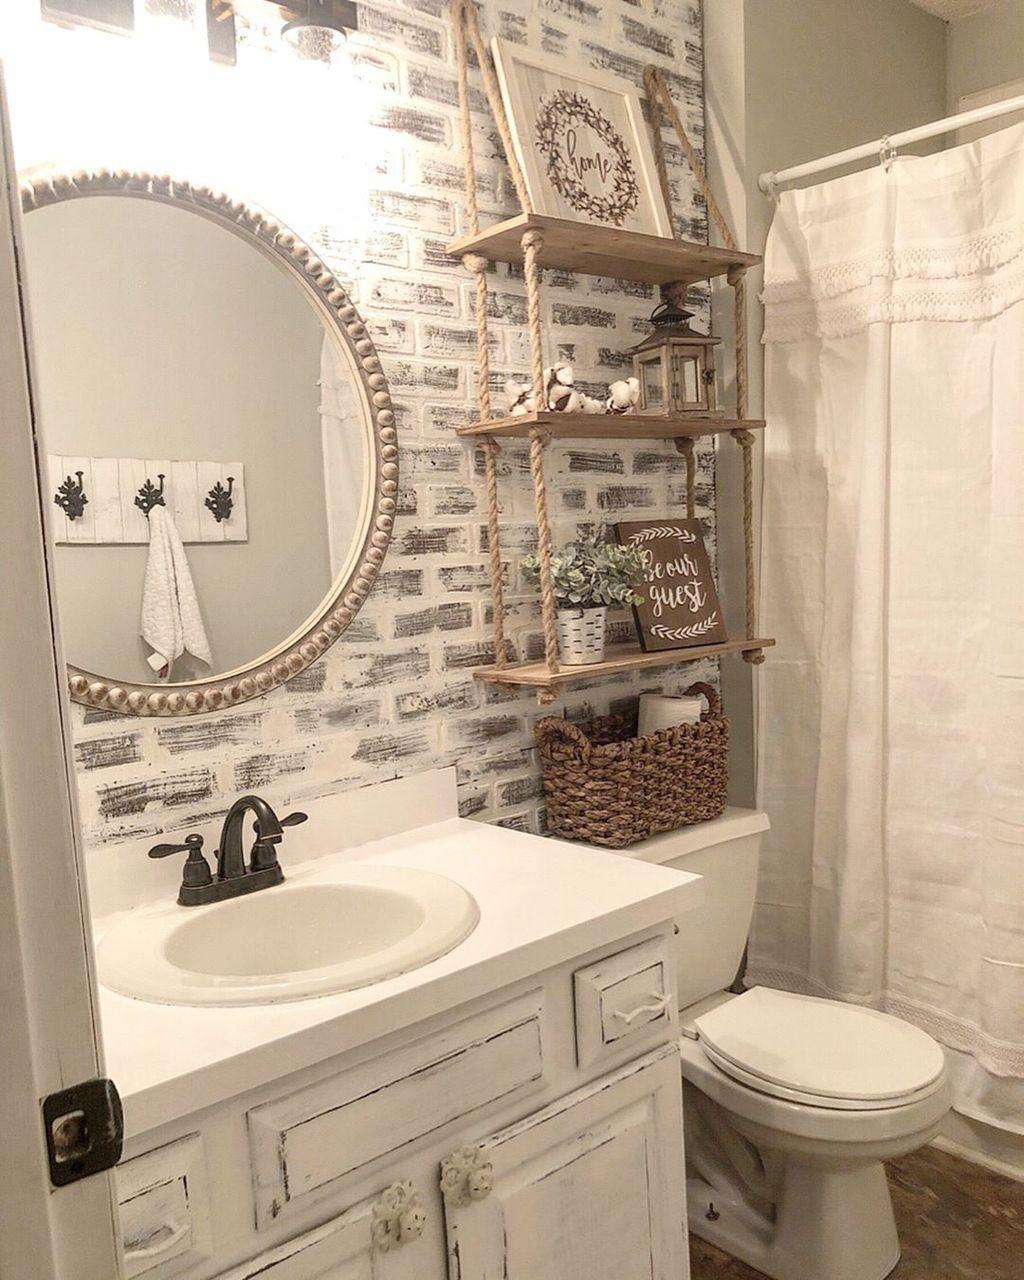 20 Outstanding Bathroom Mirror Design Ideas For Any Bathroom